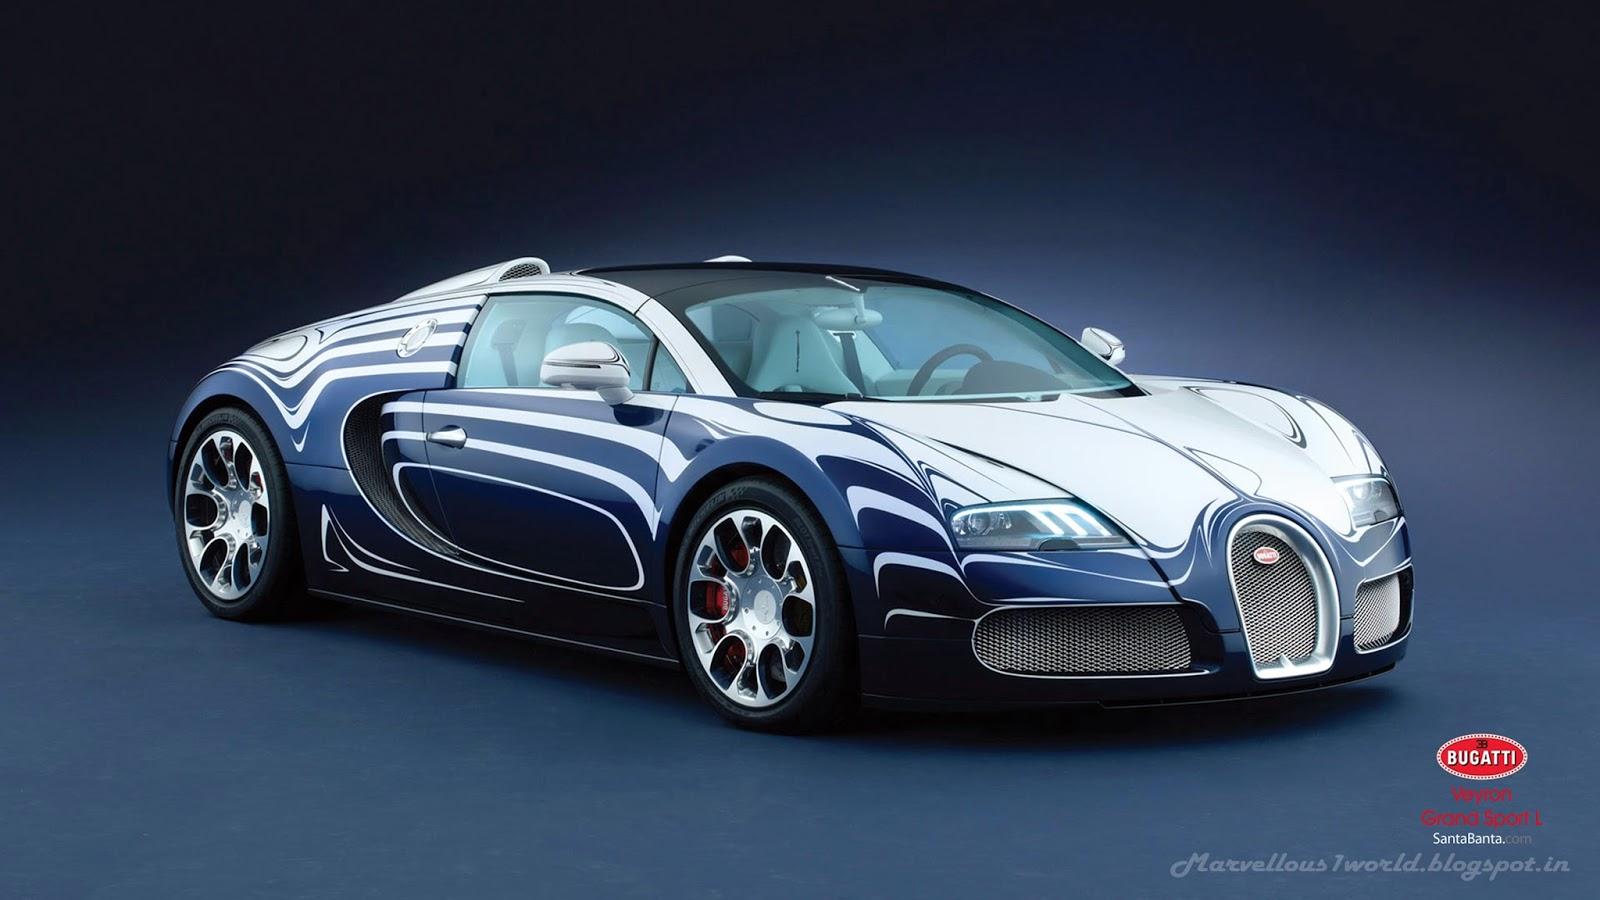 marvelous world top 5 fastest car in the world for 2015. Black Bedroom Furniture Sets. Home Design Ideas